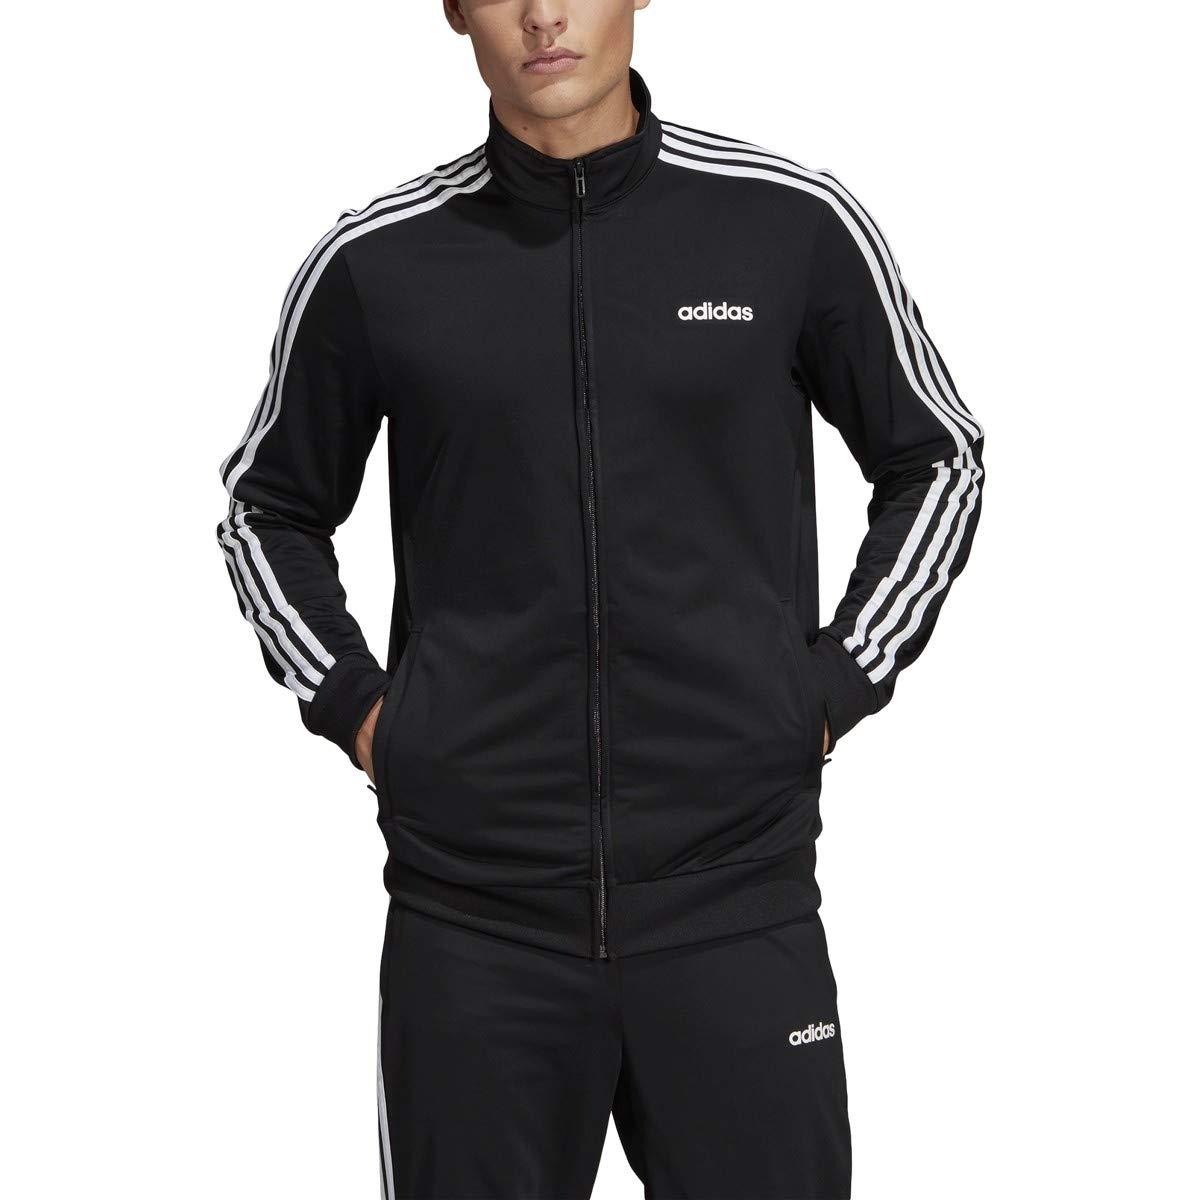 adidas Essentials Men's 3 Stripes Tricot Track Jacket, BlackWhite, LargeTall